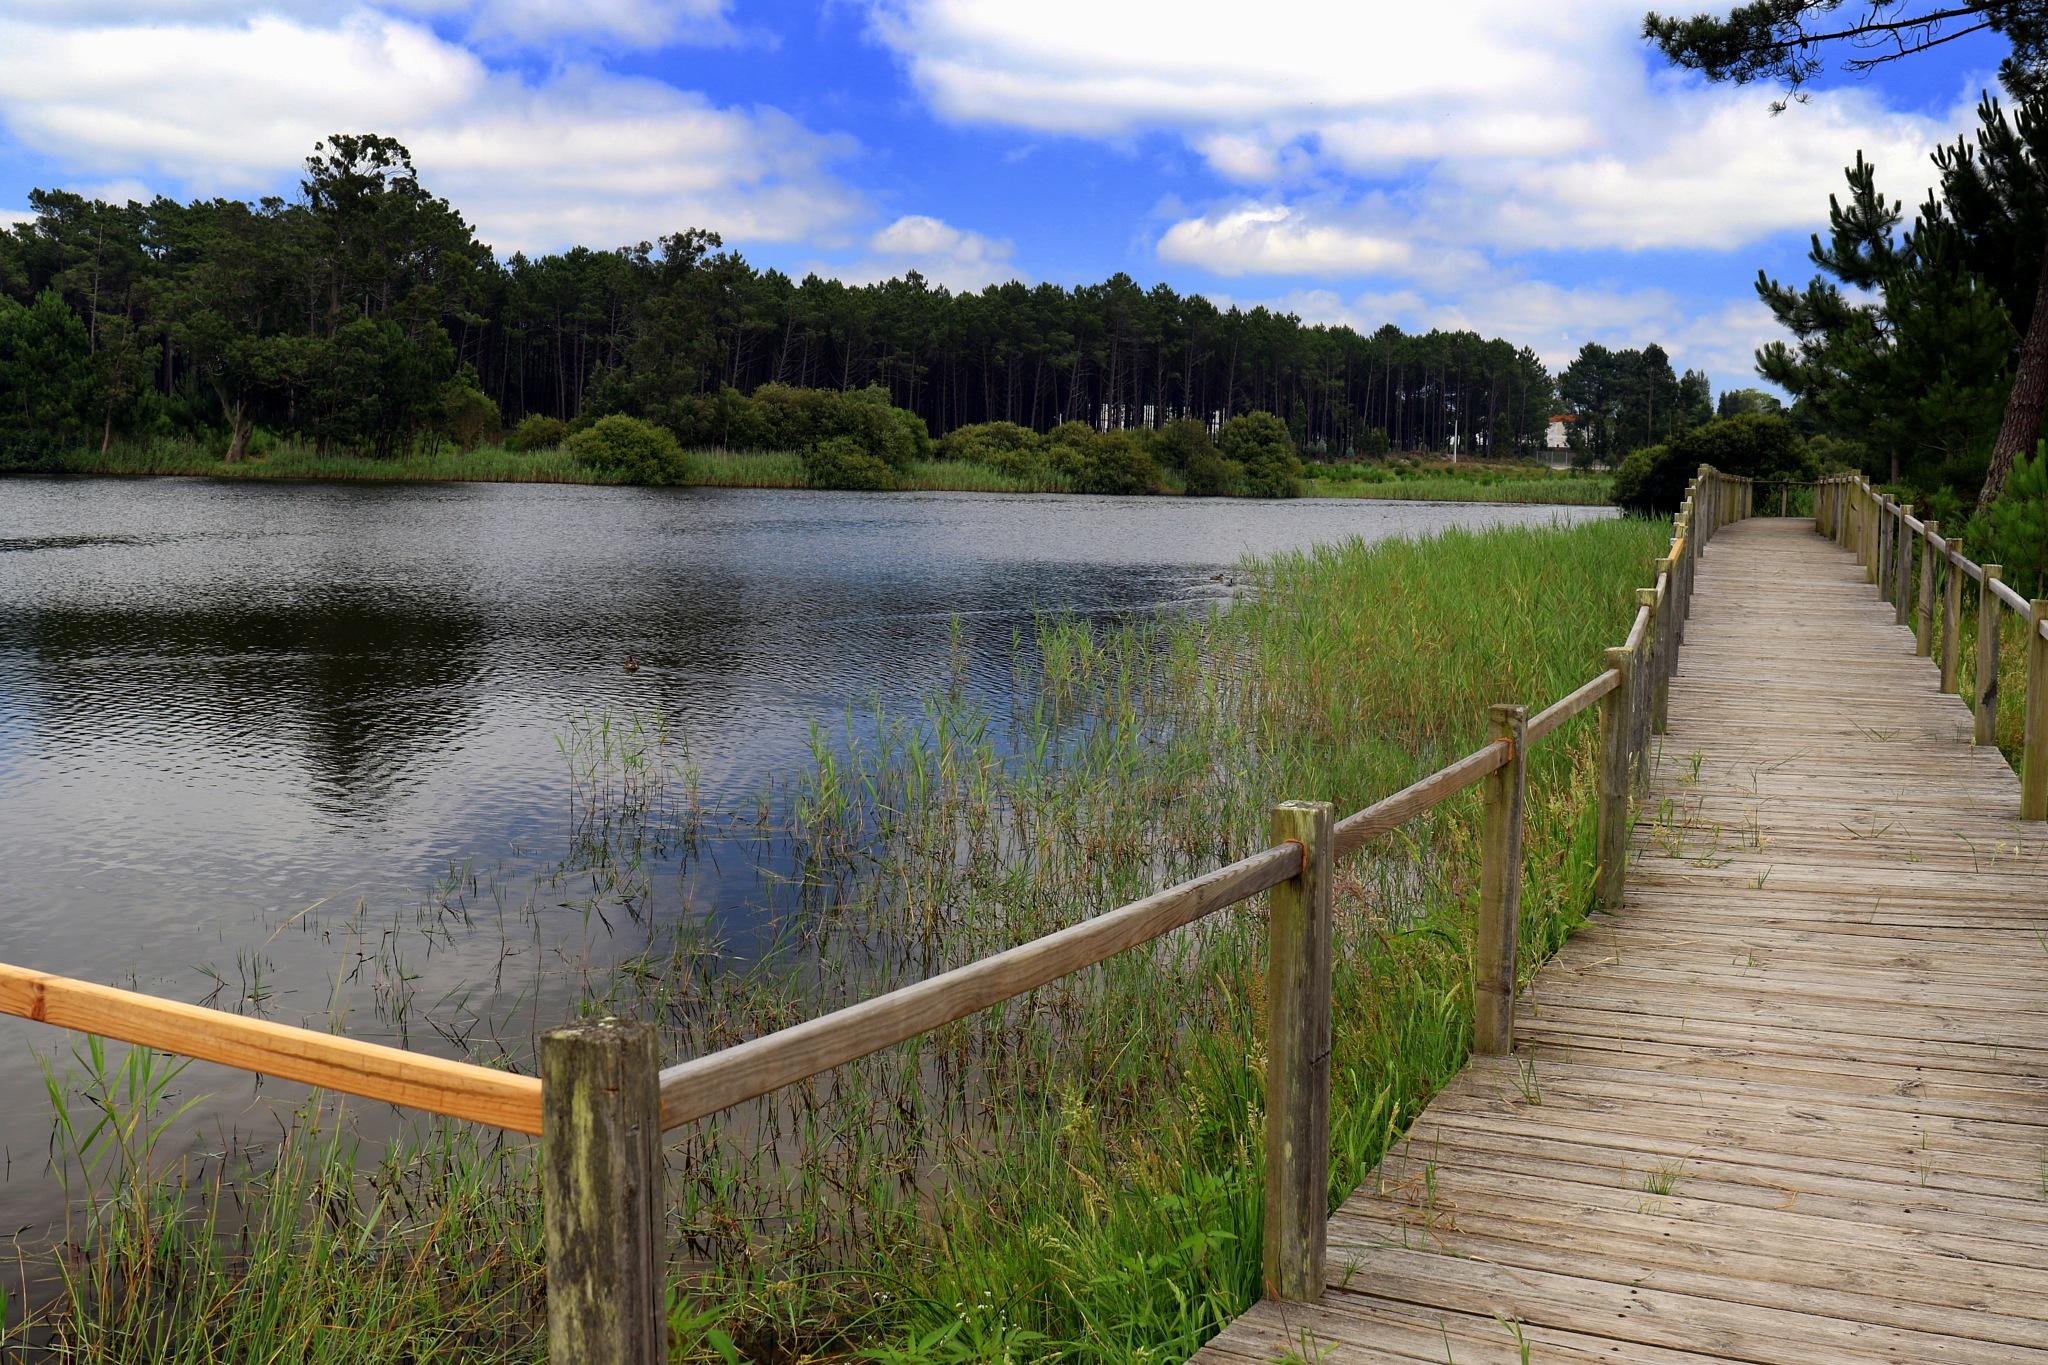 Lagoon by GilReis